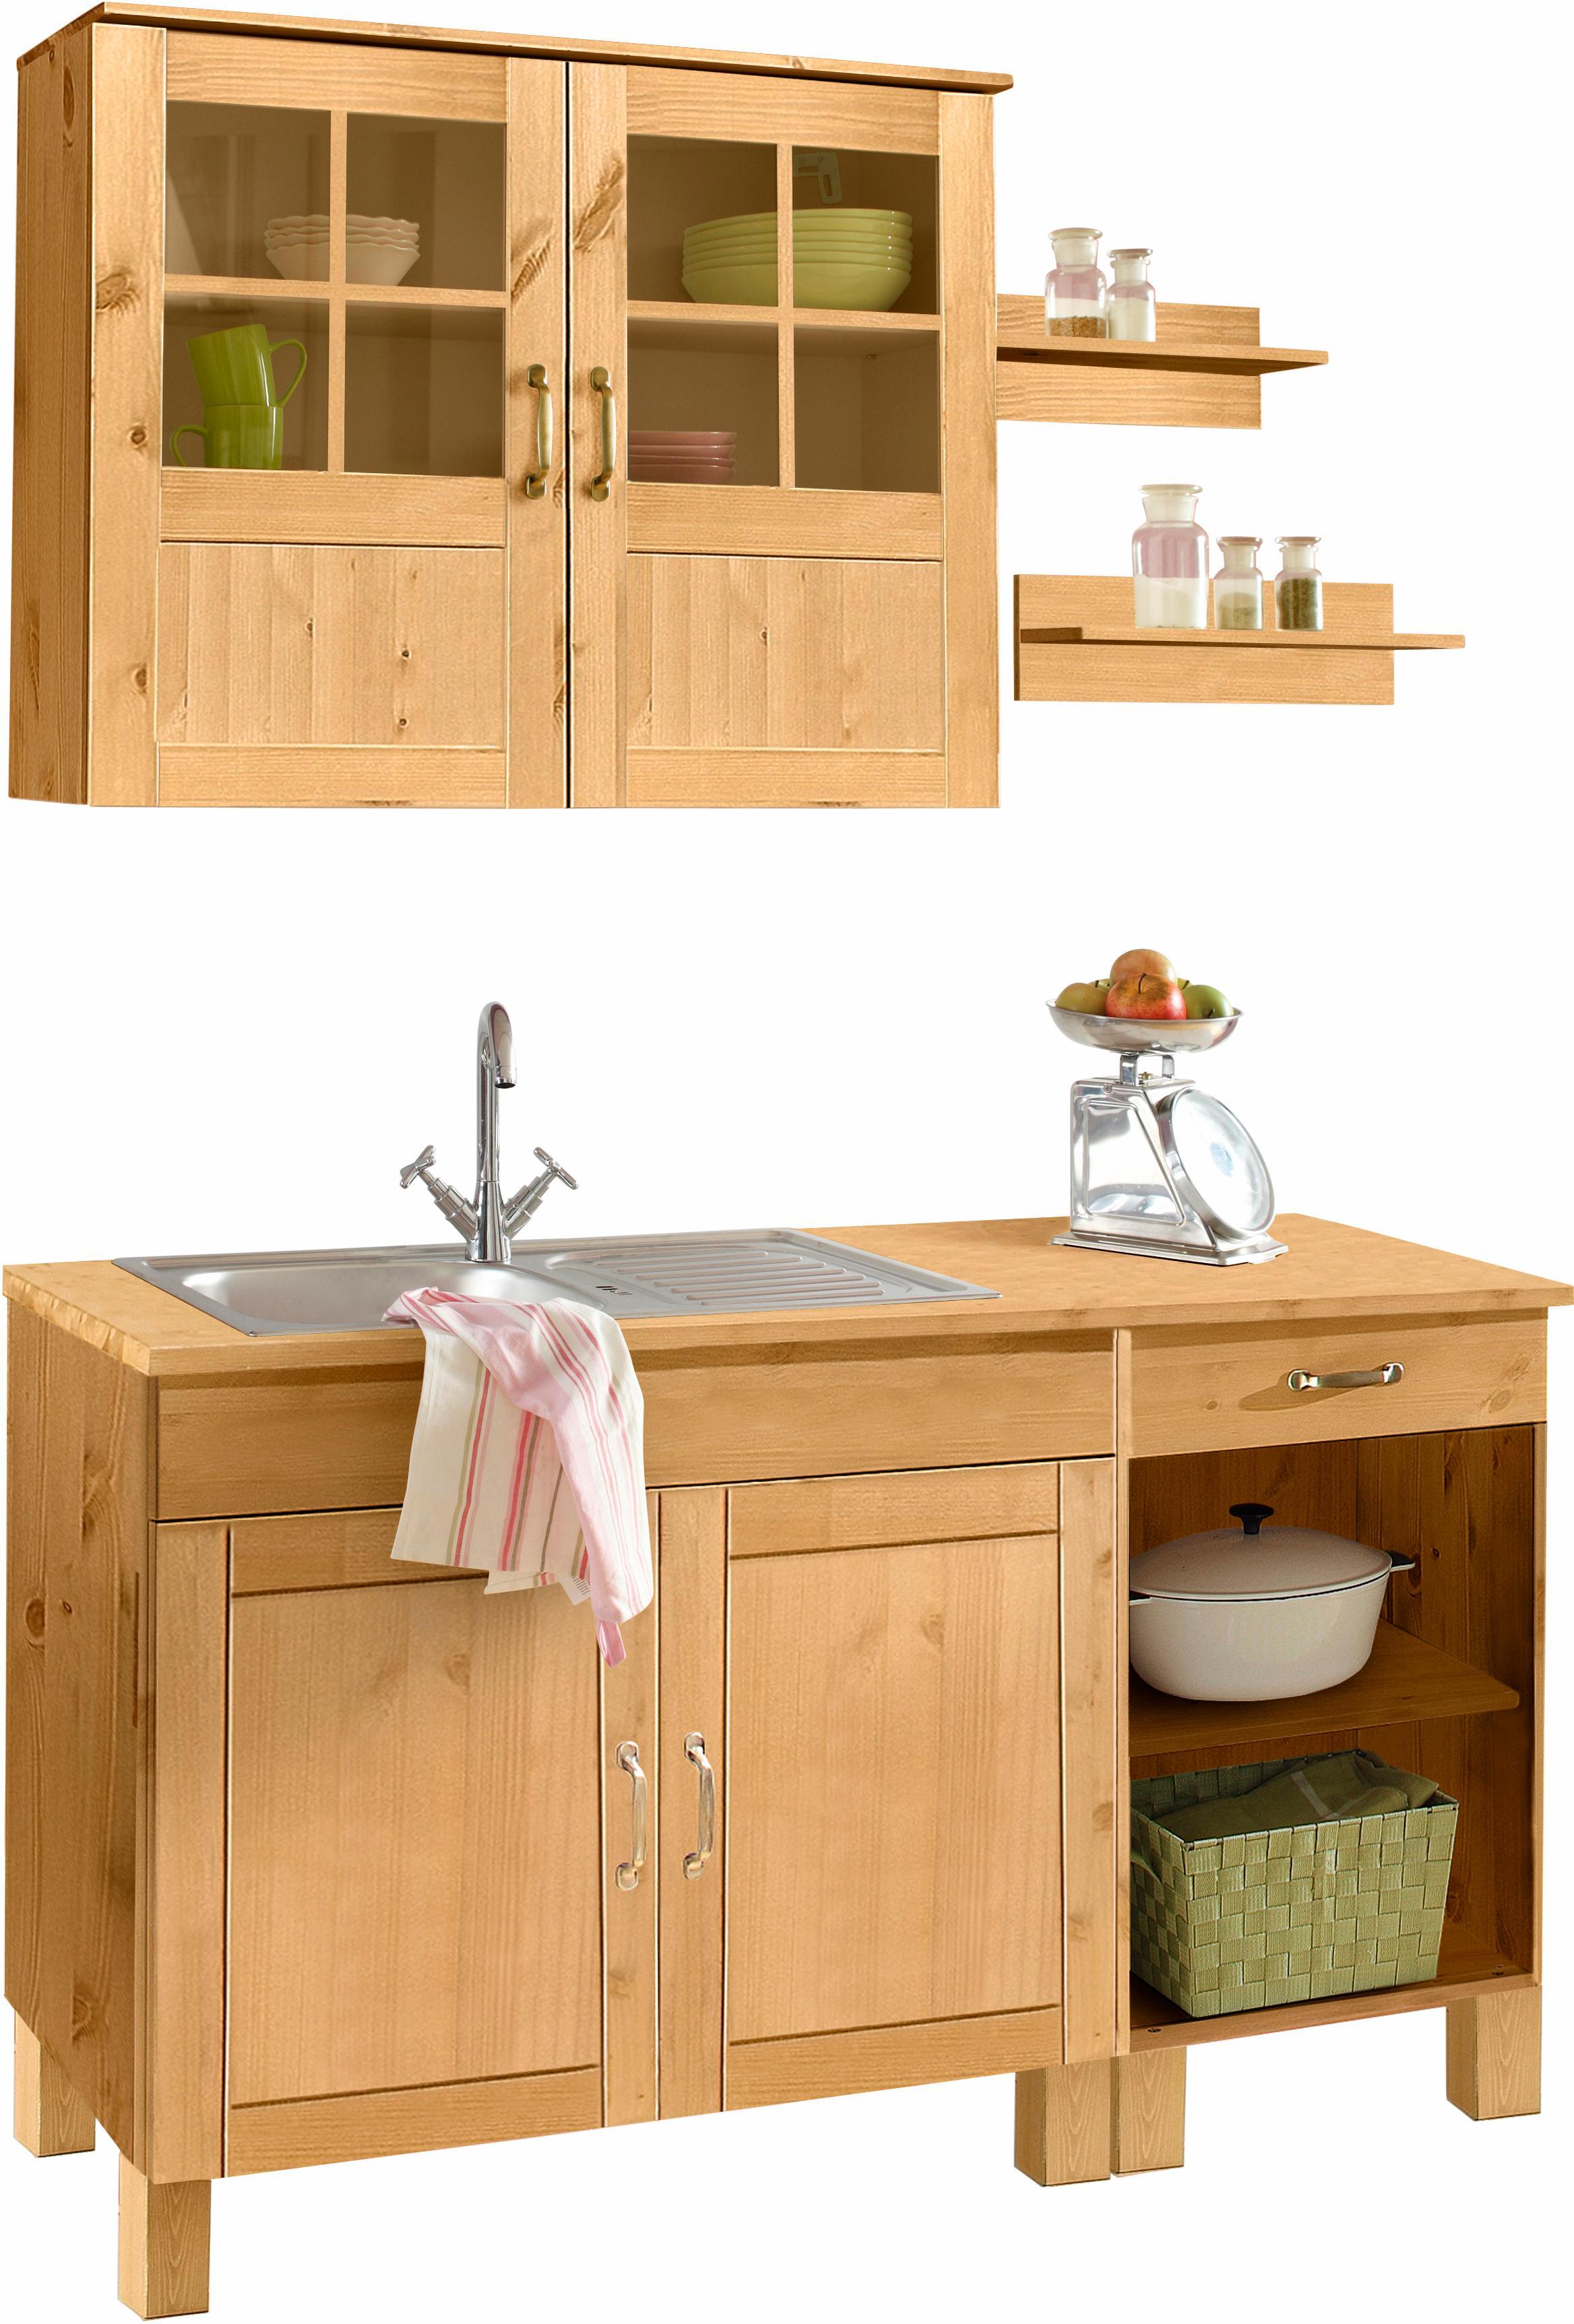 home affaire k chen set alby ohne e ger te breite 150. Black Bedroom Furniture Sets. Home Design Ideas